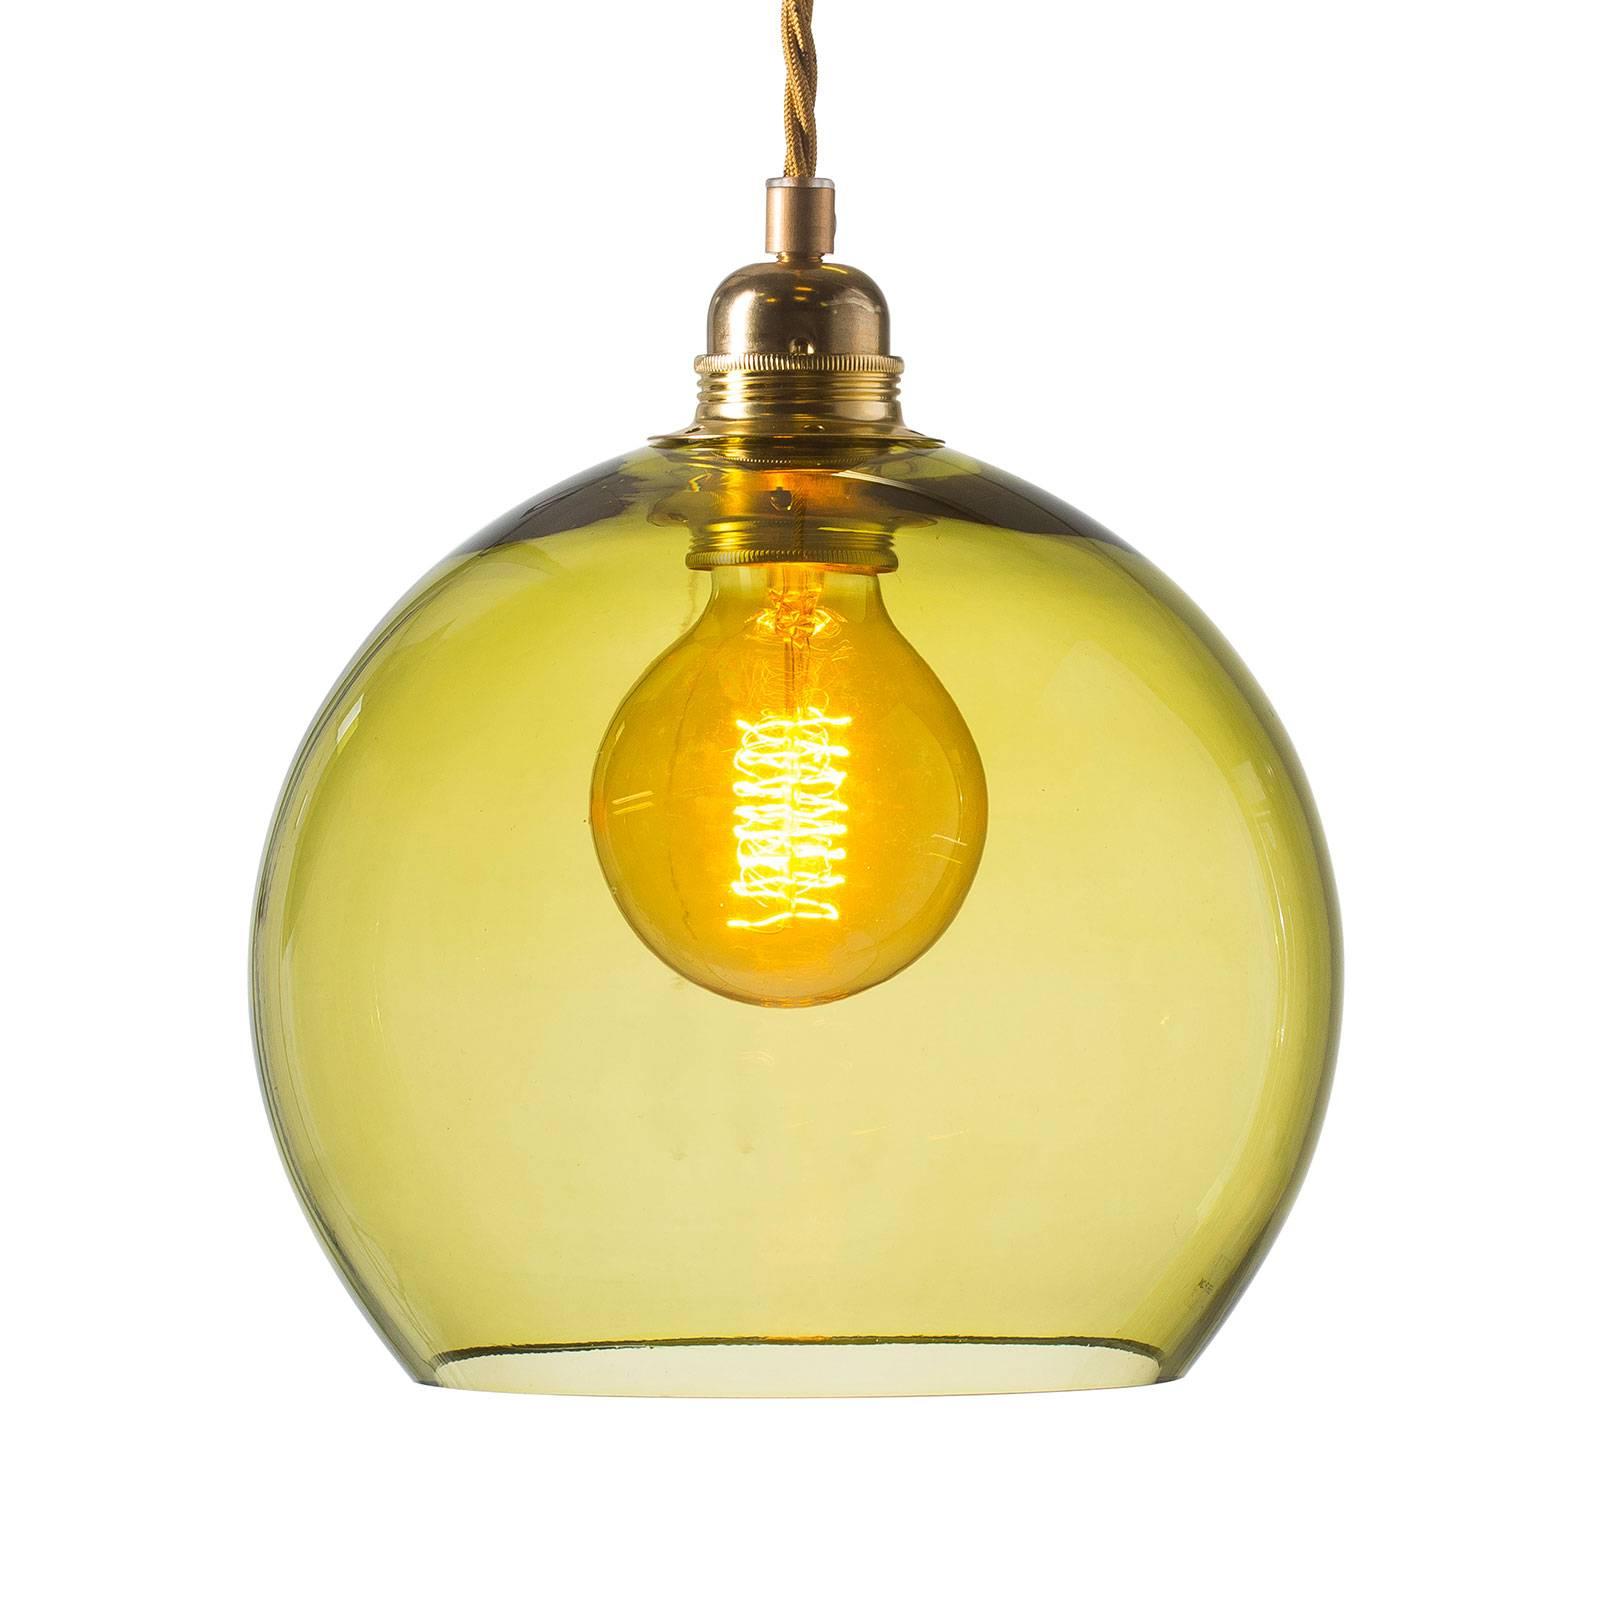 EBB & FLOW Rowan hanglamp goud/olijfgroen Ø 22cm